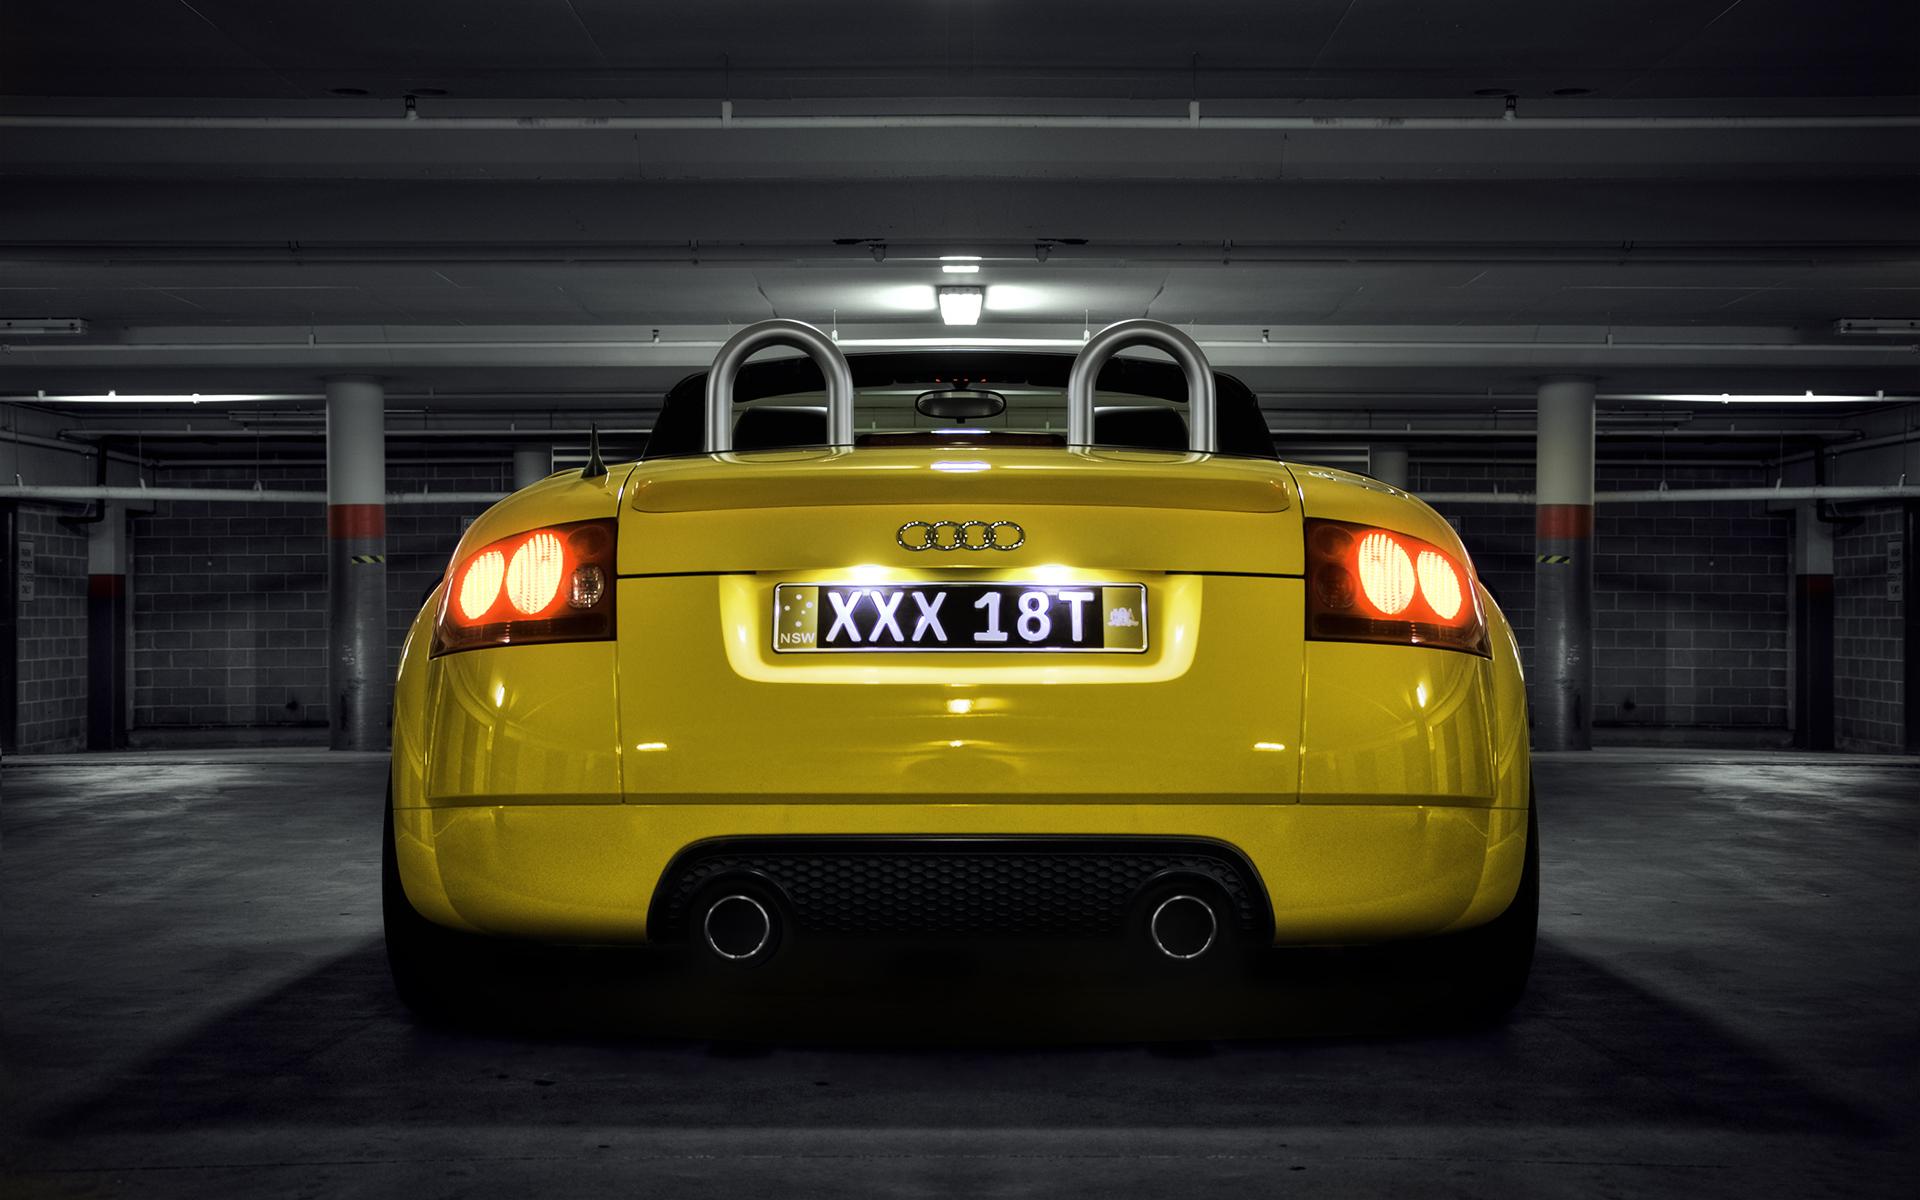 Audi Tt Mk1 Fondo De Pantalla Hd Fondo De Escritorio